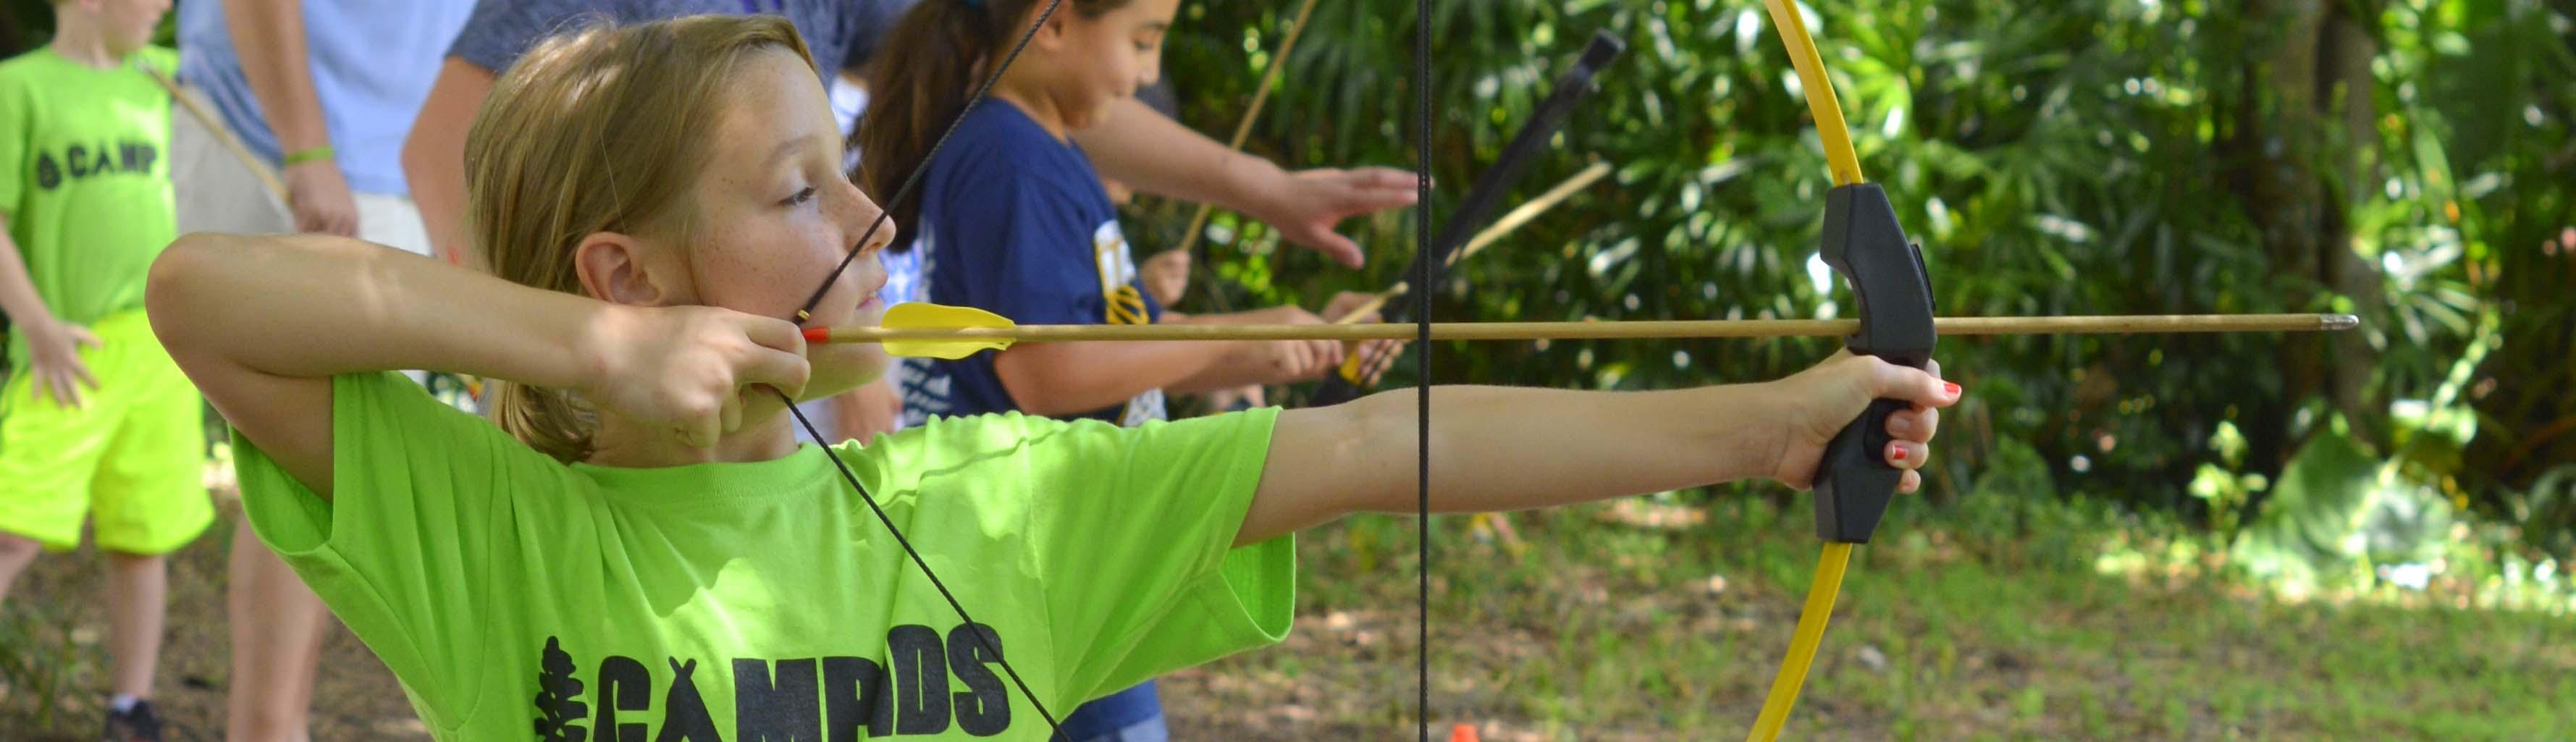 Corbett Prep Summer Camp | CAMP IDS Tampa